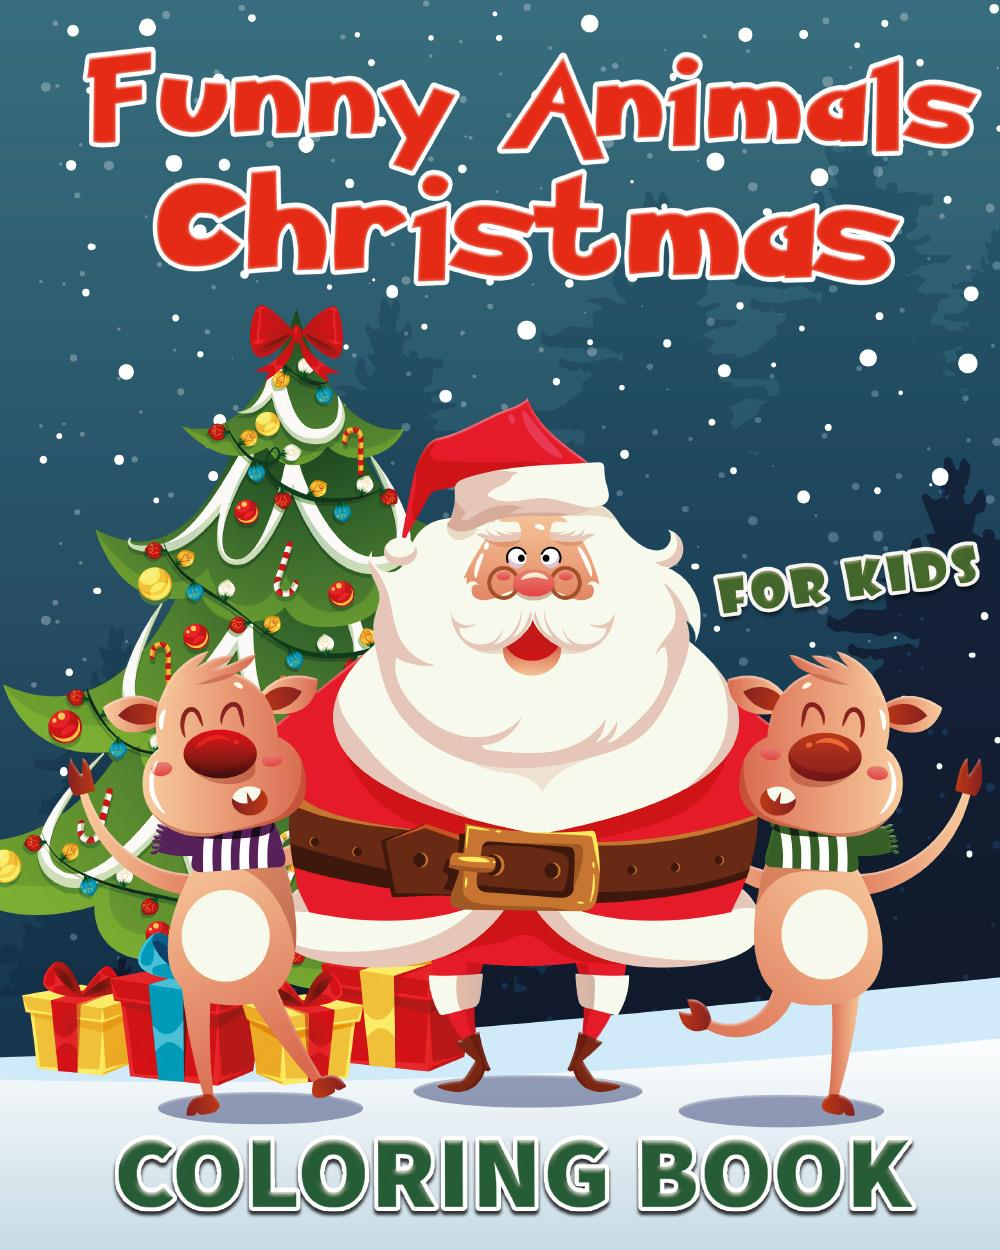 Funny Animals Christmas for Kids